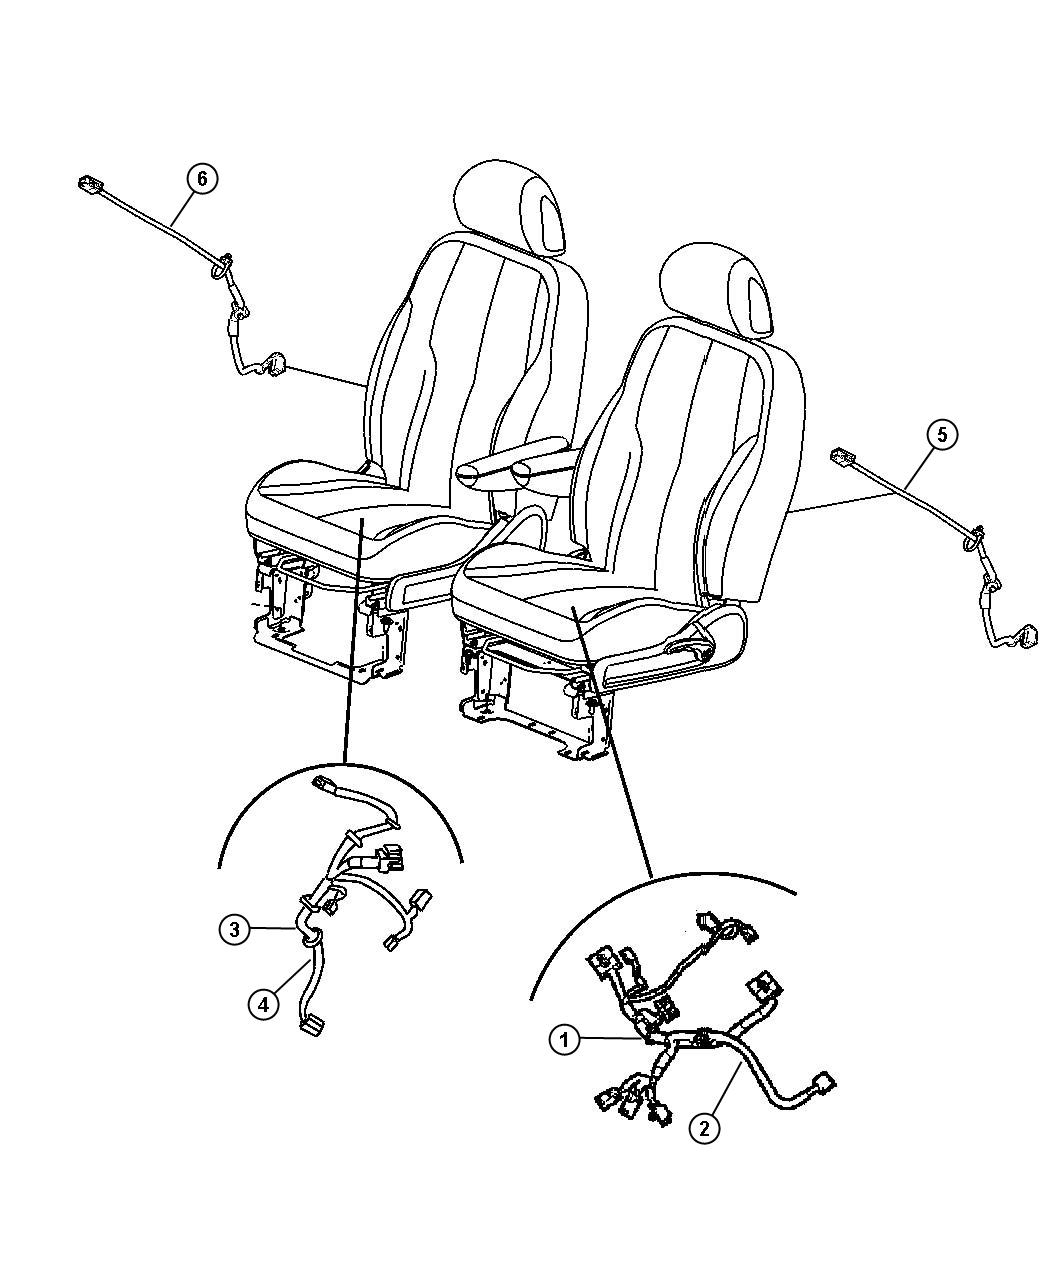 Chrysler Pt Cruiser Wiring. Power seat. Power, side air